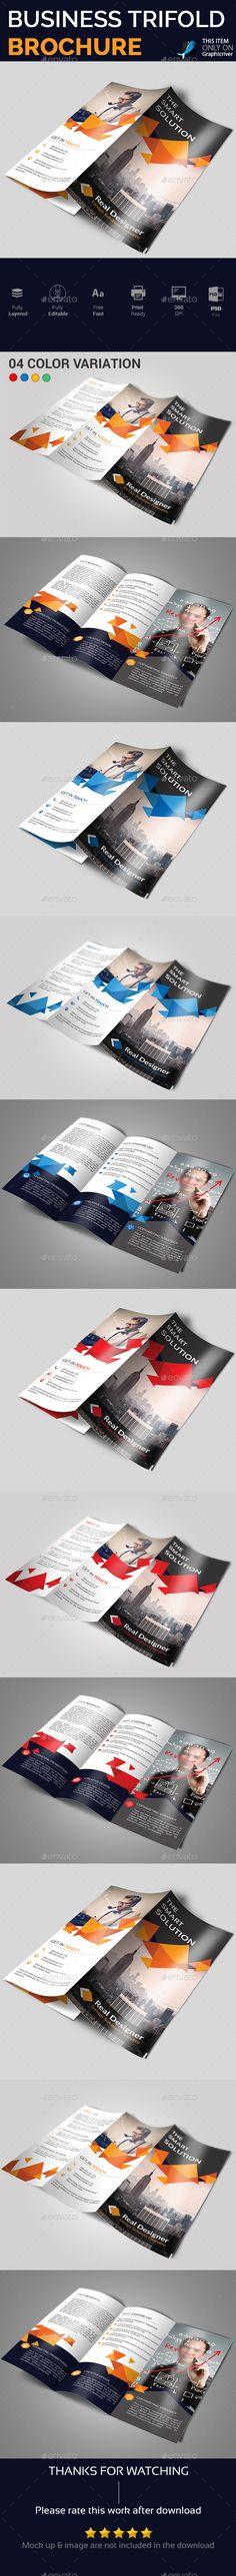 Company Business Tri fold Brochure Template PSD